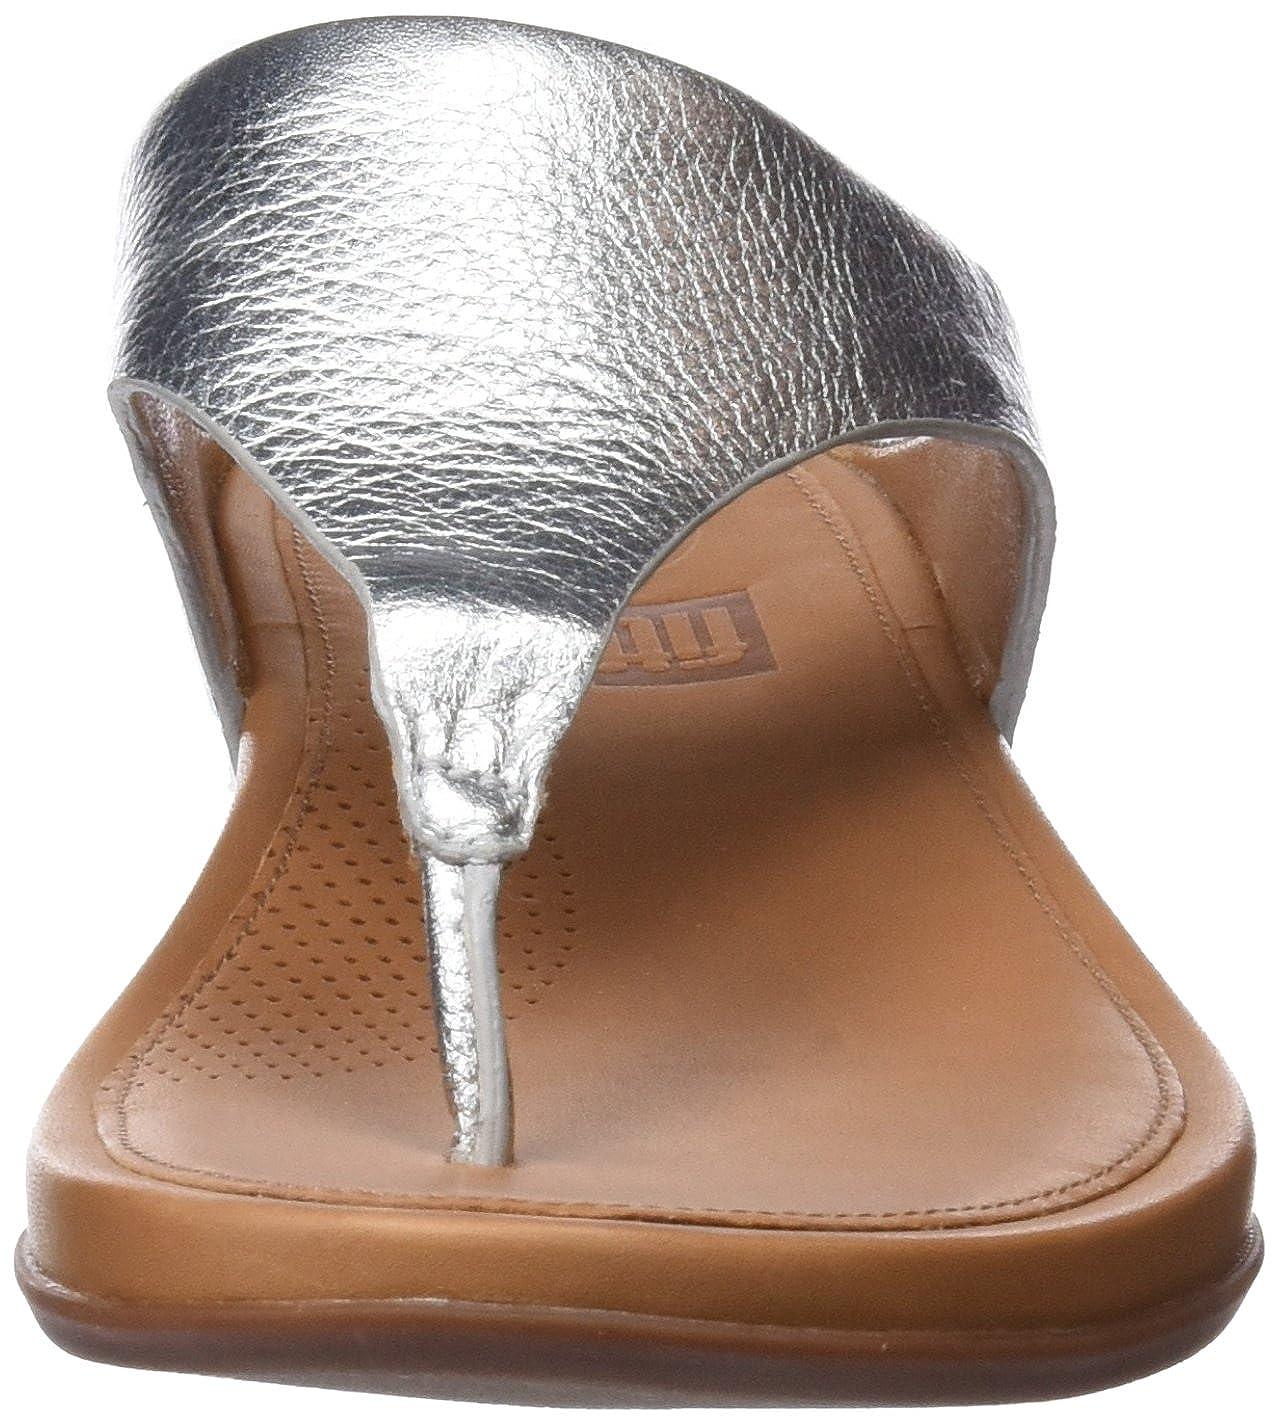 FitFlop Damen Banda 011) PlateauSandale, Silber Silber (Silver 011) Banda 5e9672